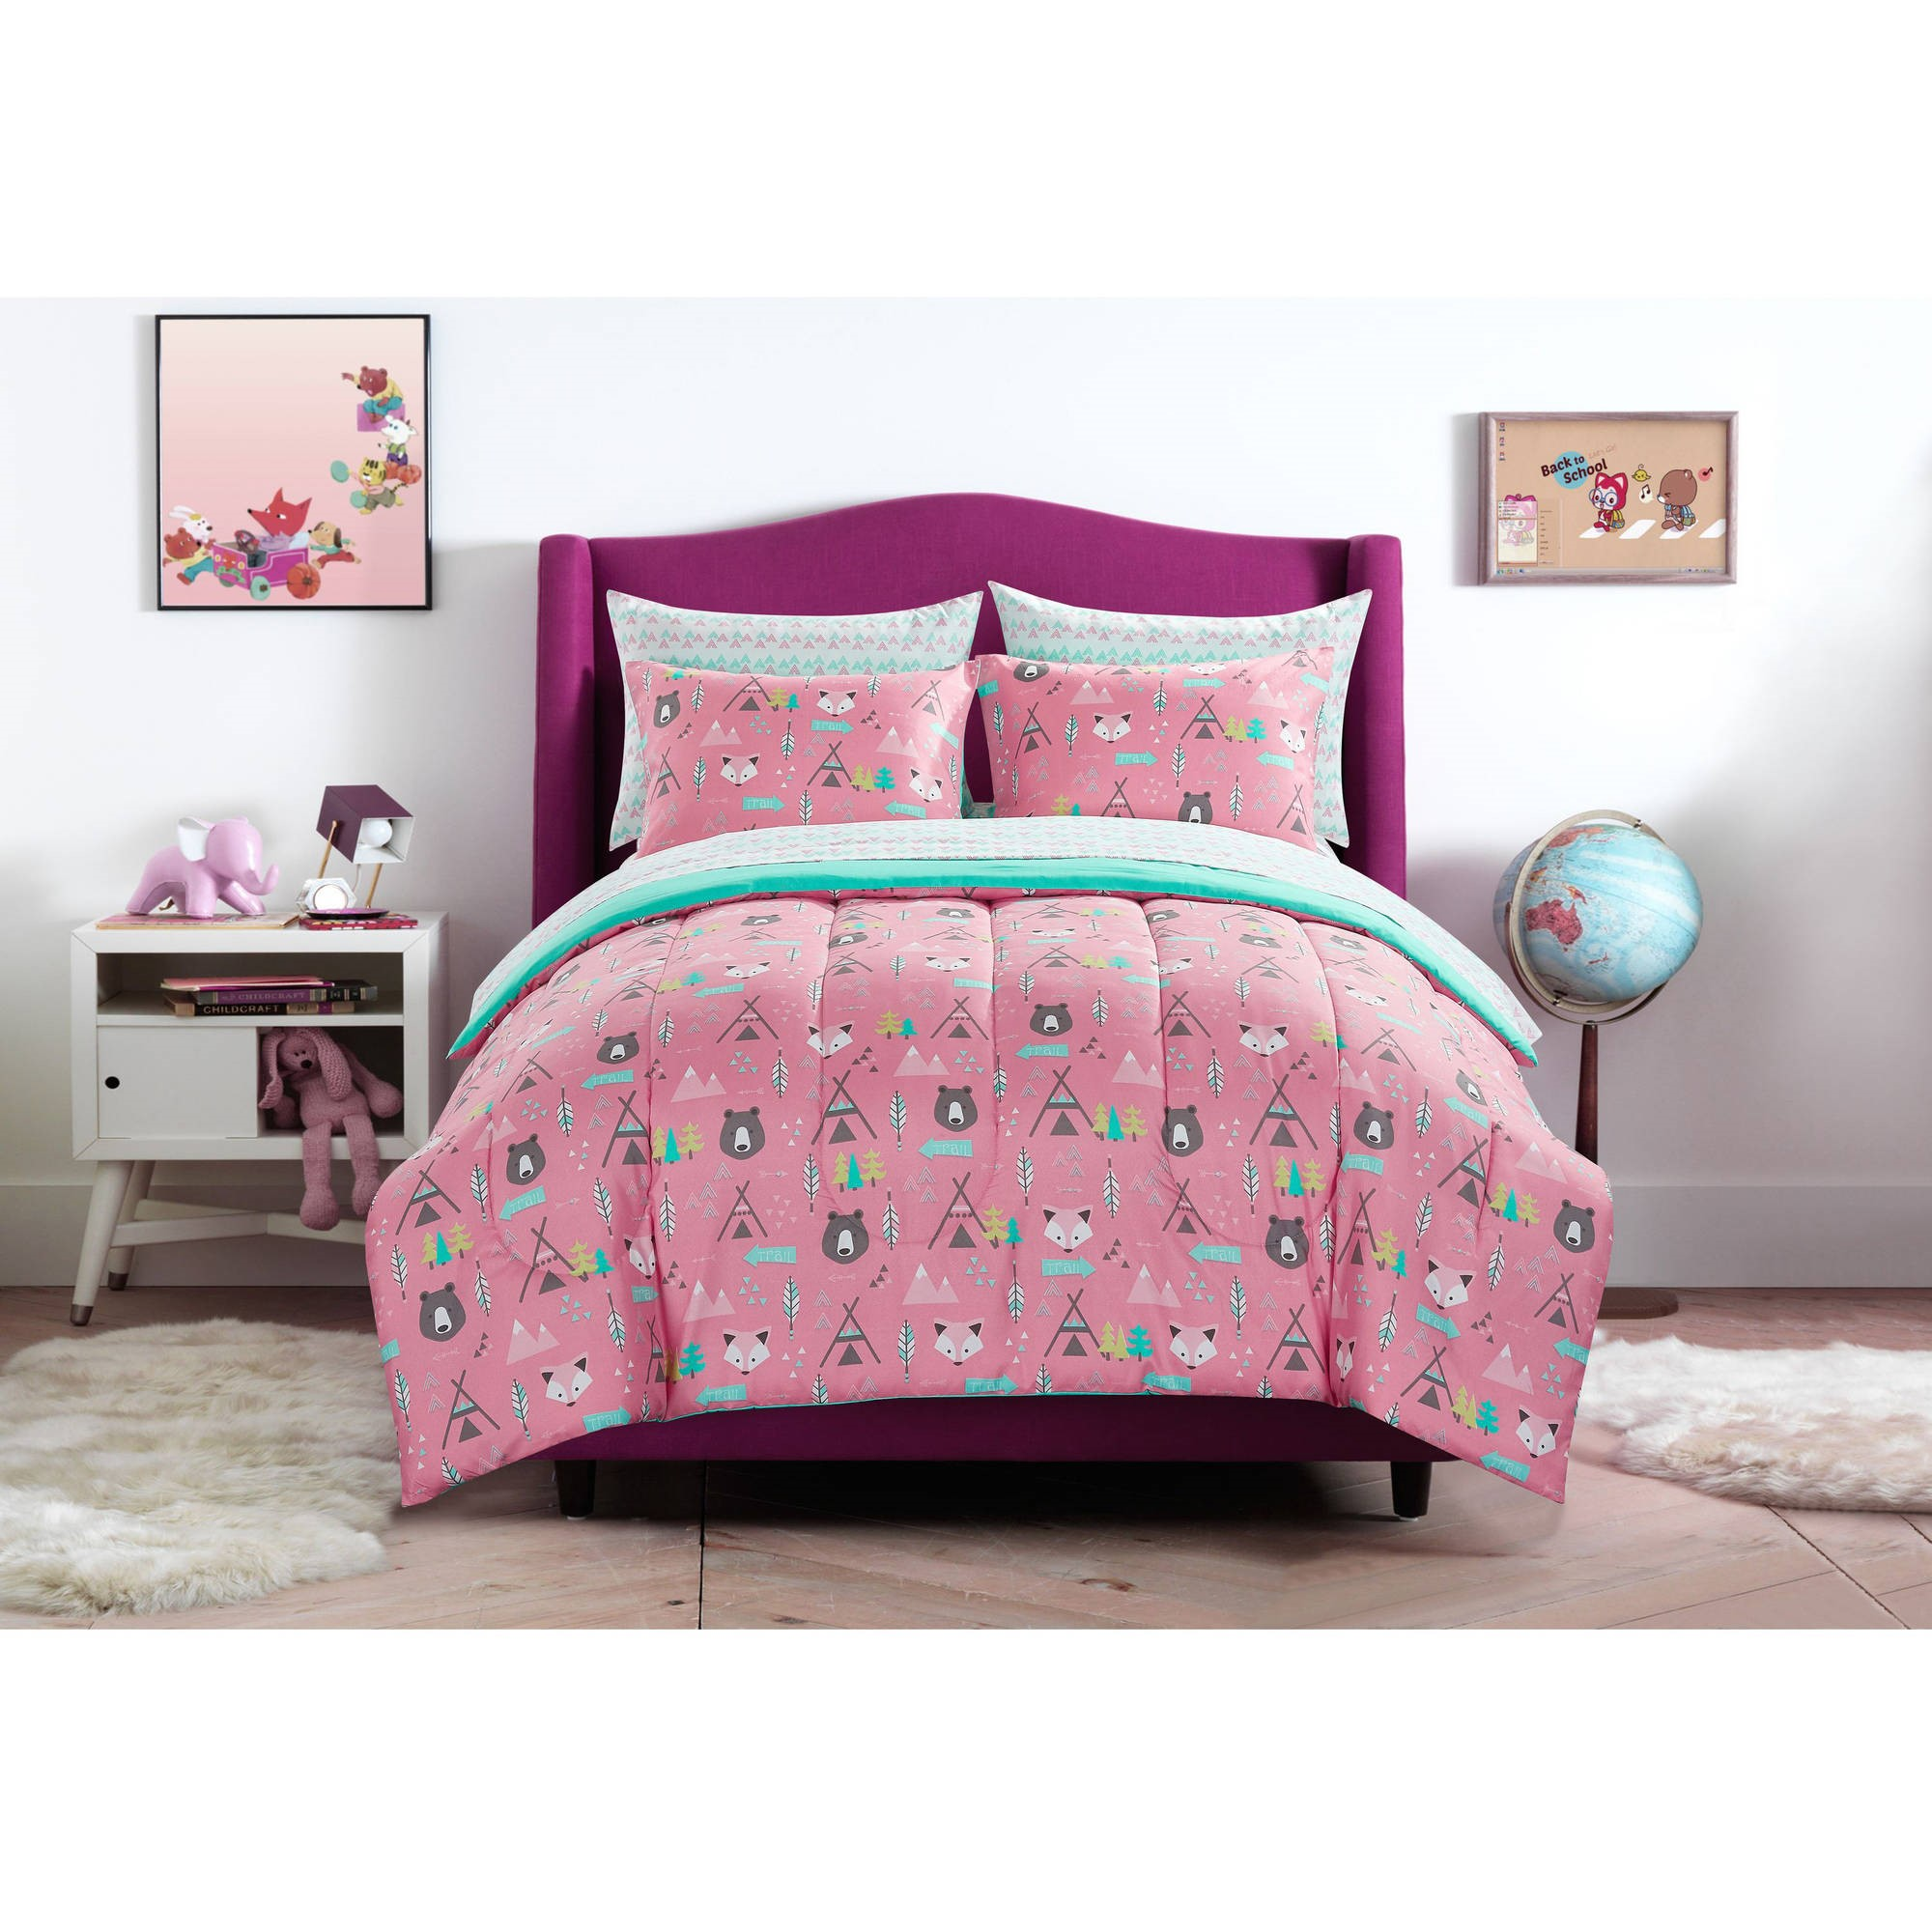 Superior Mainstays Kids Woodland Safari Girl Bed In A Bag Bedding Set